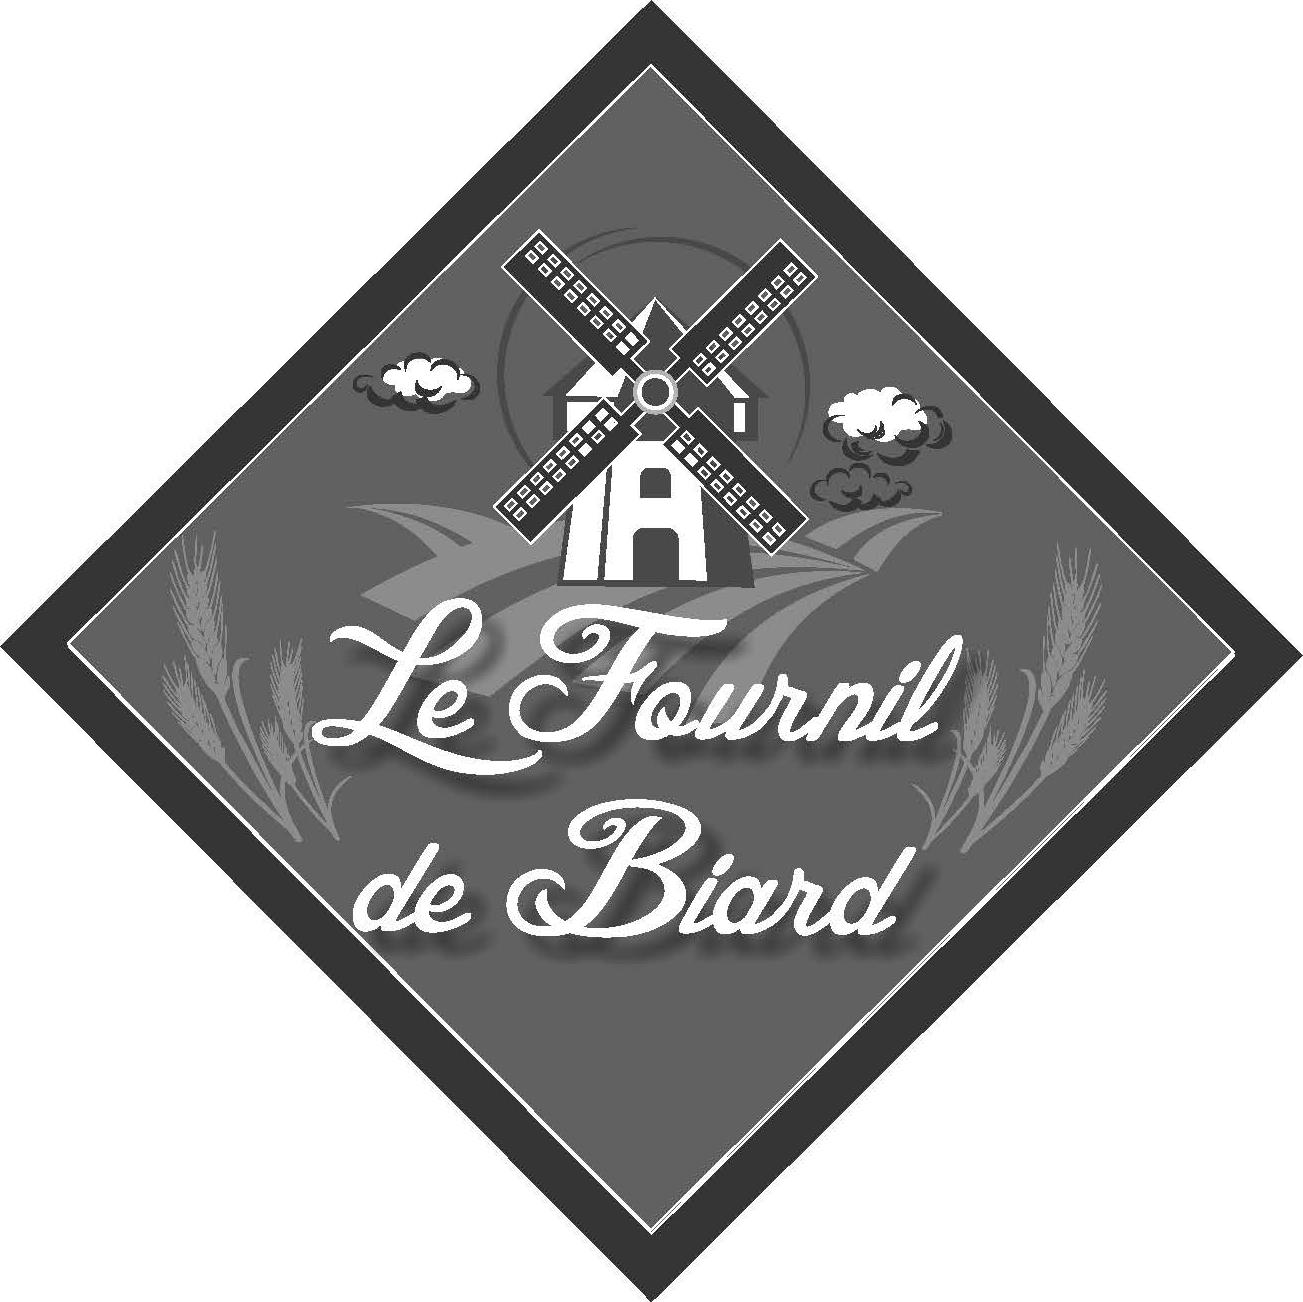 logo Le Fournil de Biard.jpg